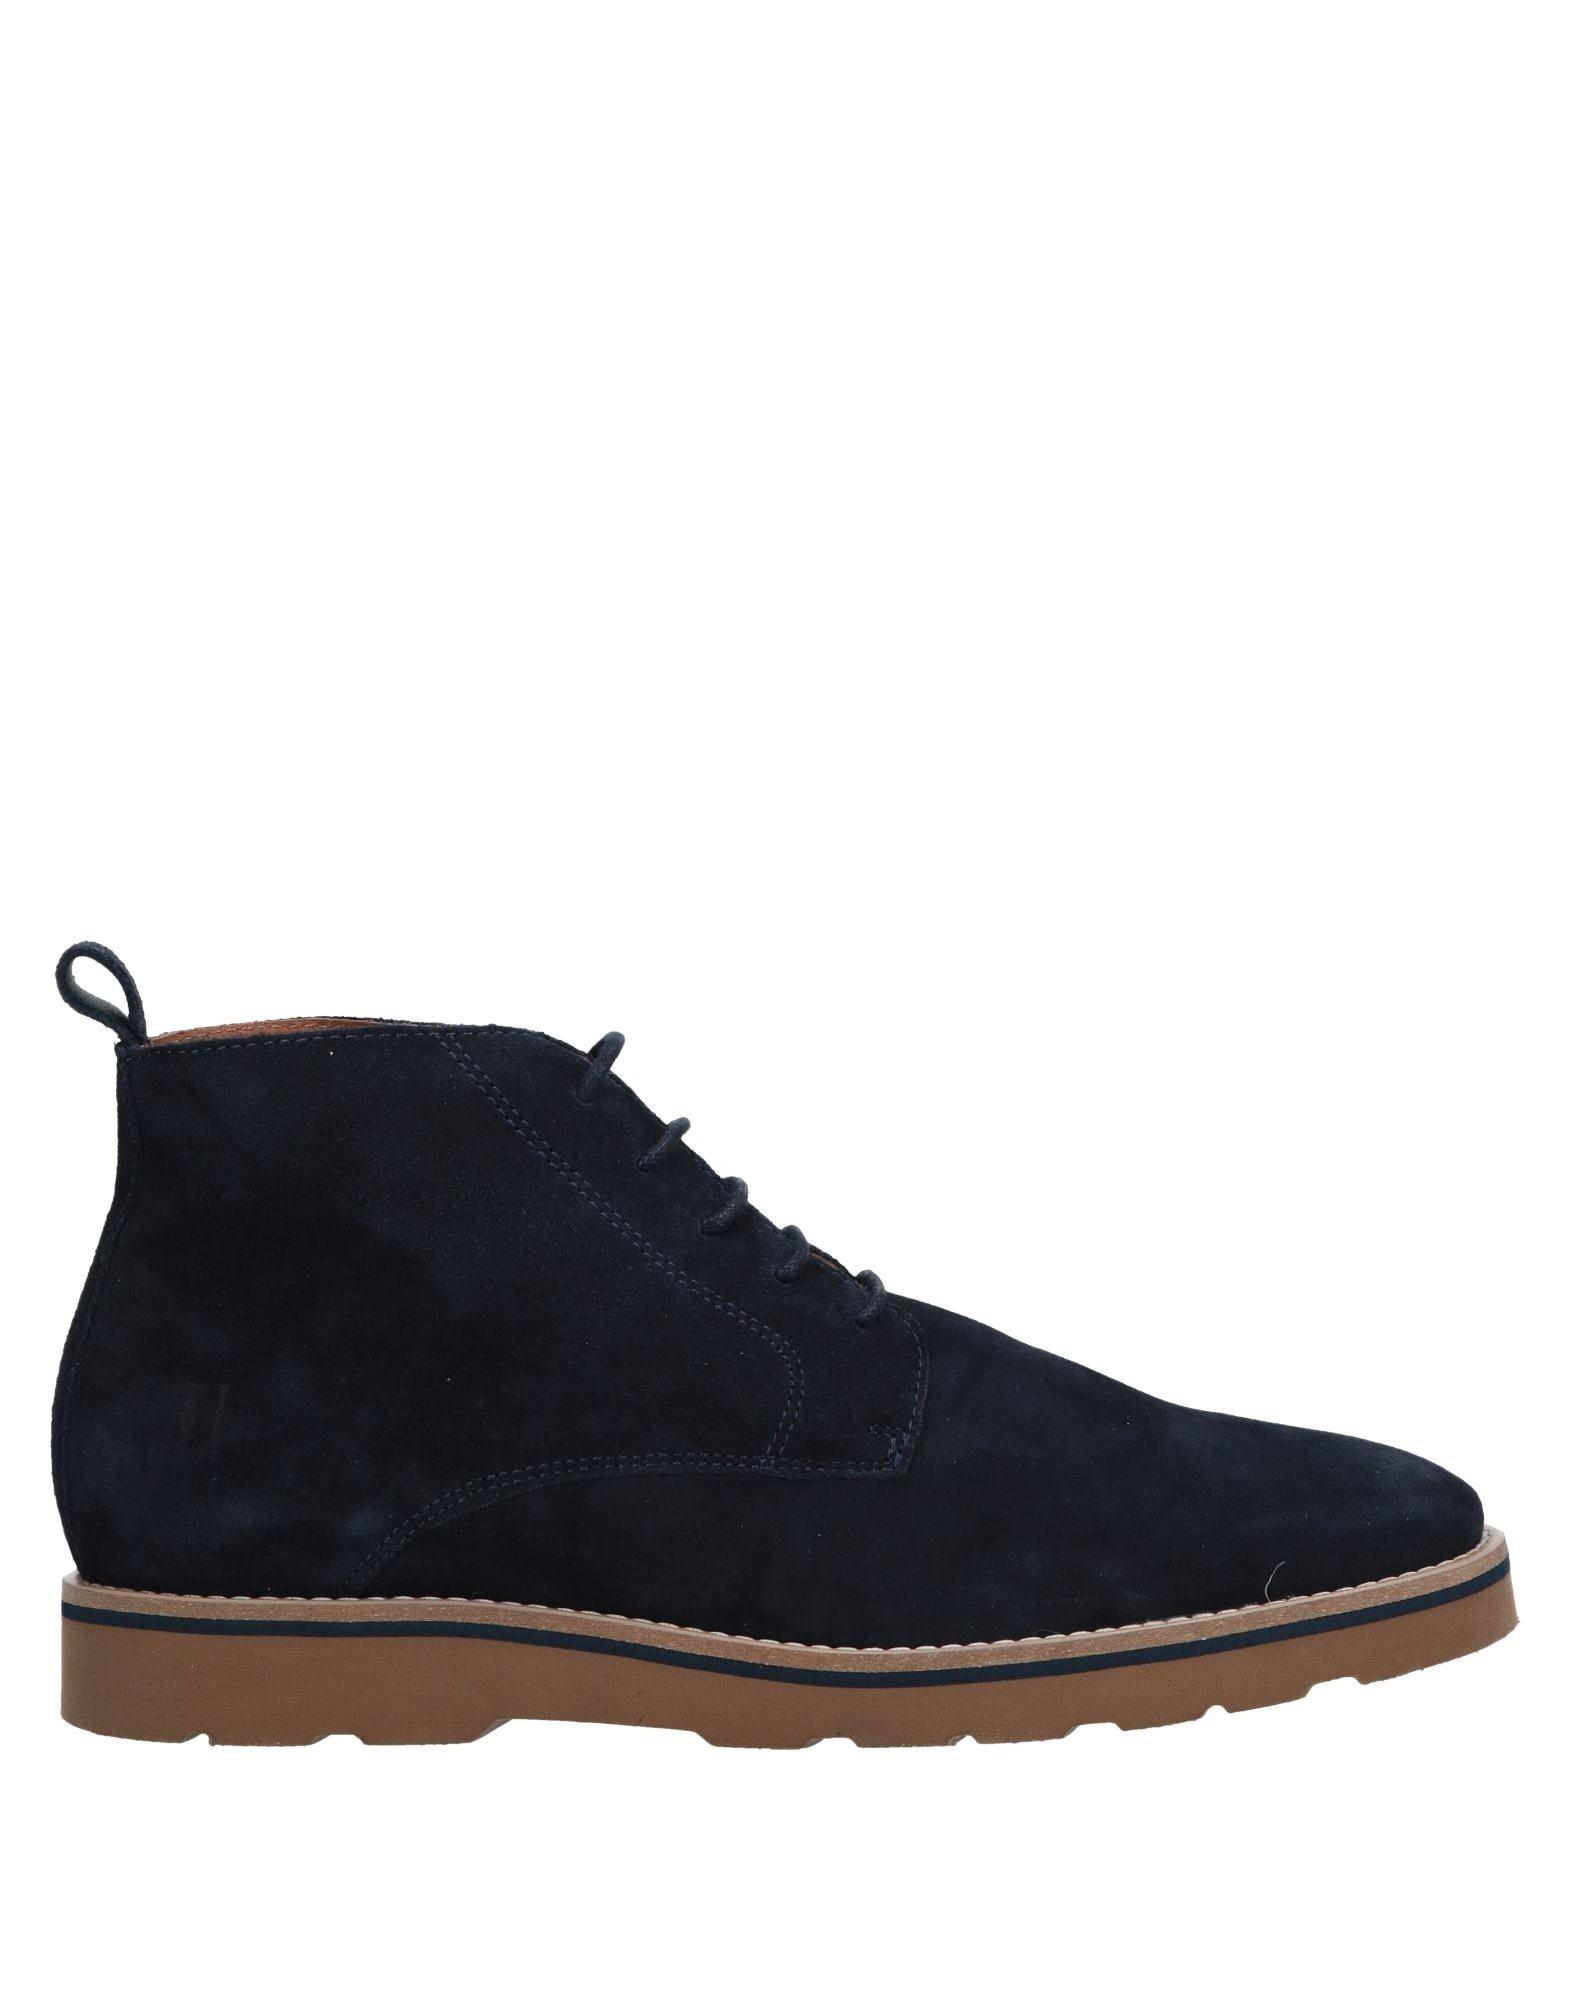 TRUSSARDI JEANS Полусапоги и высокие ботинки